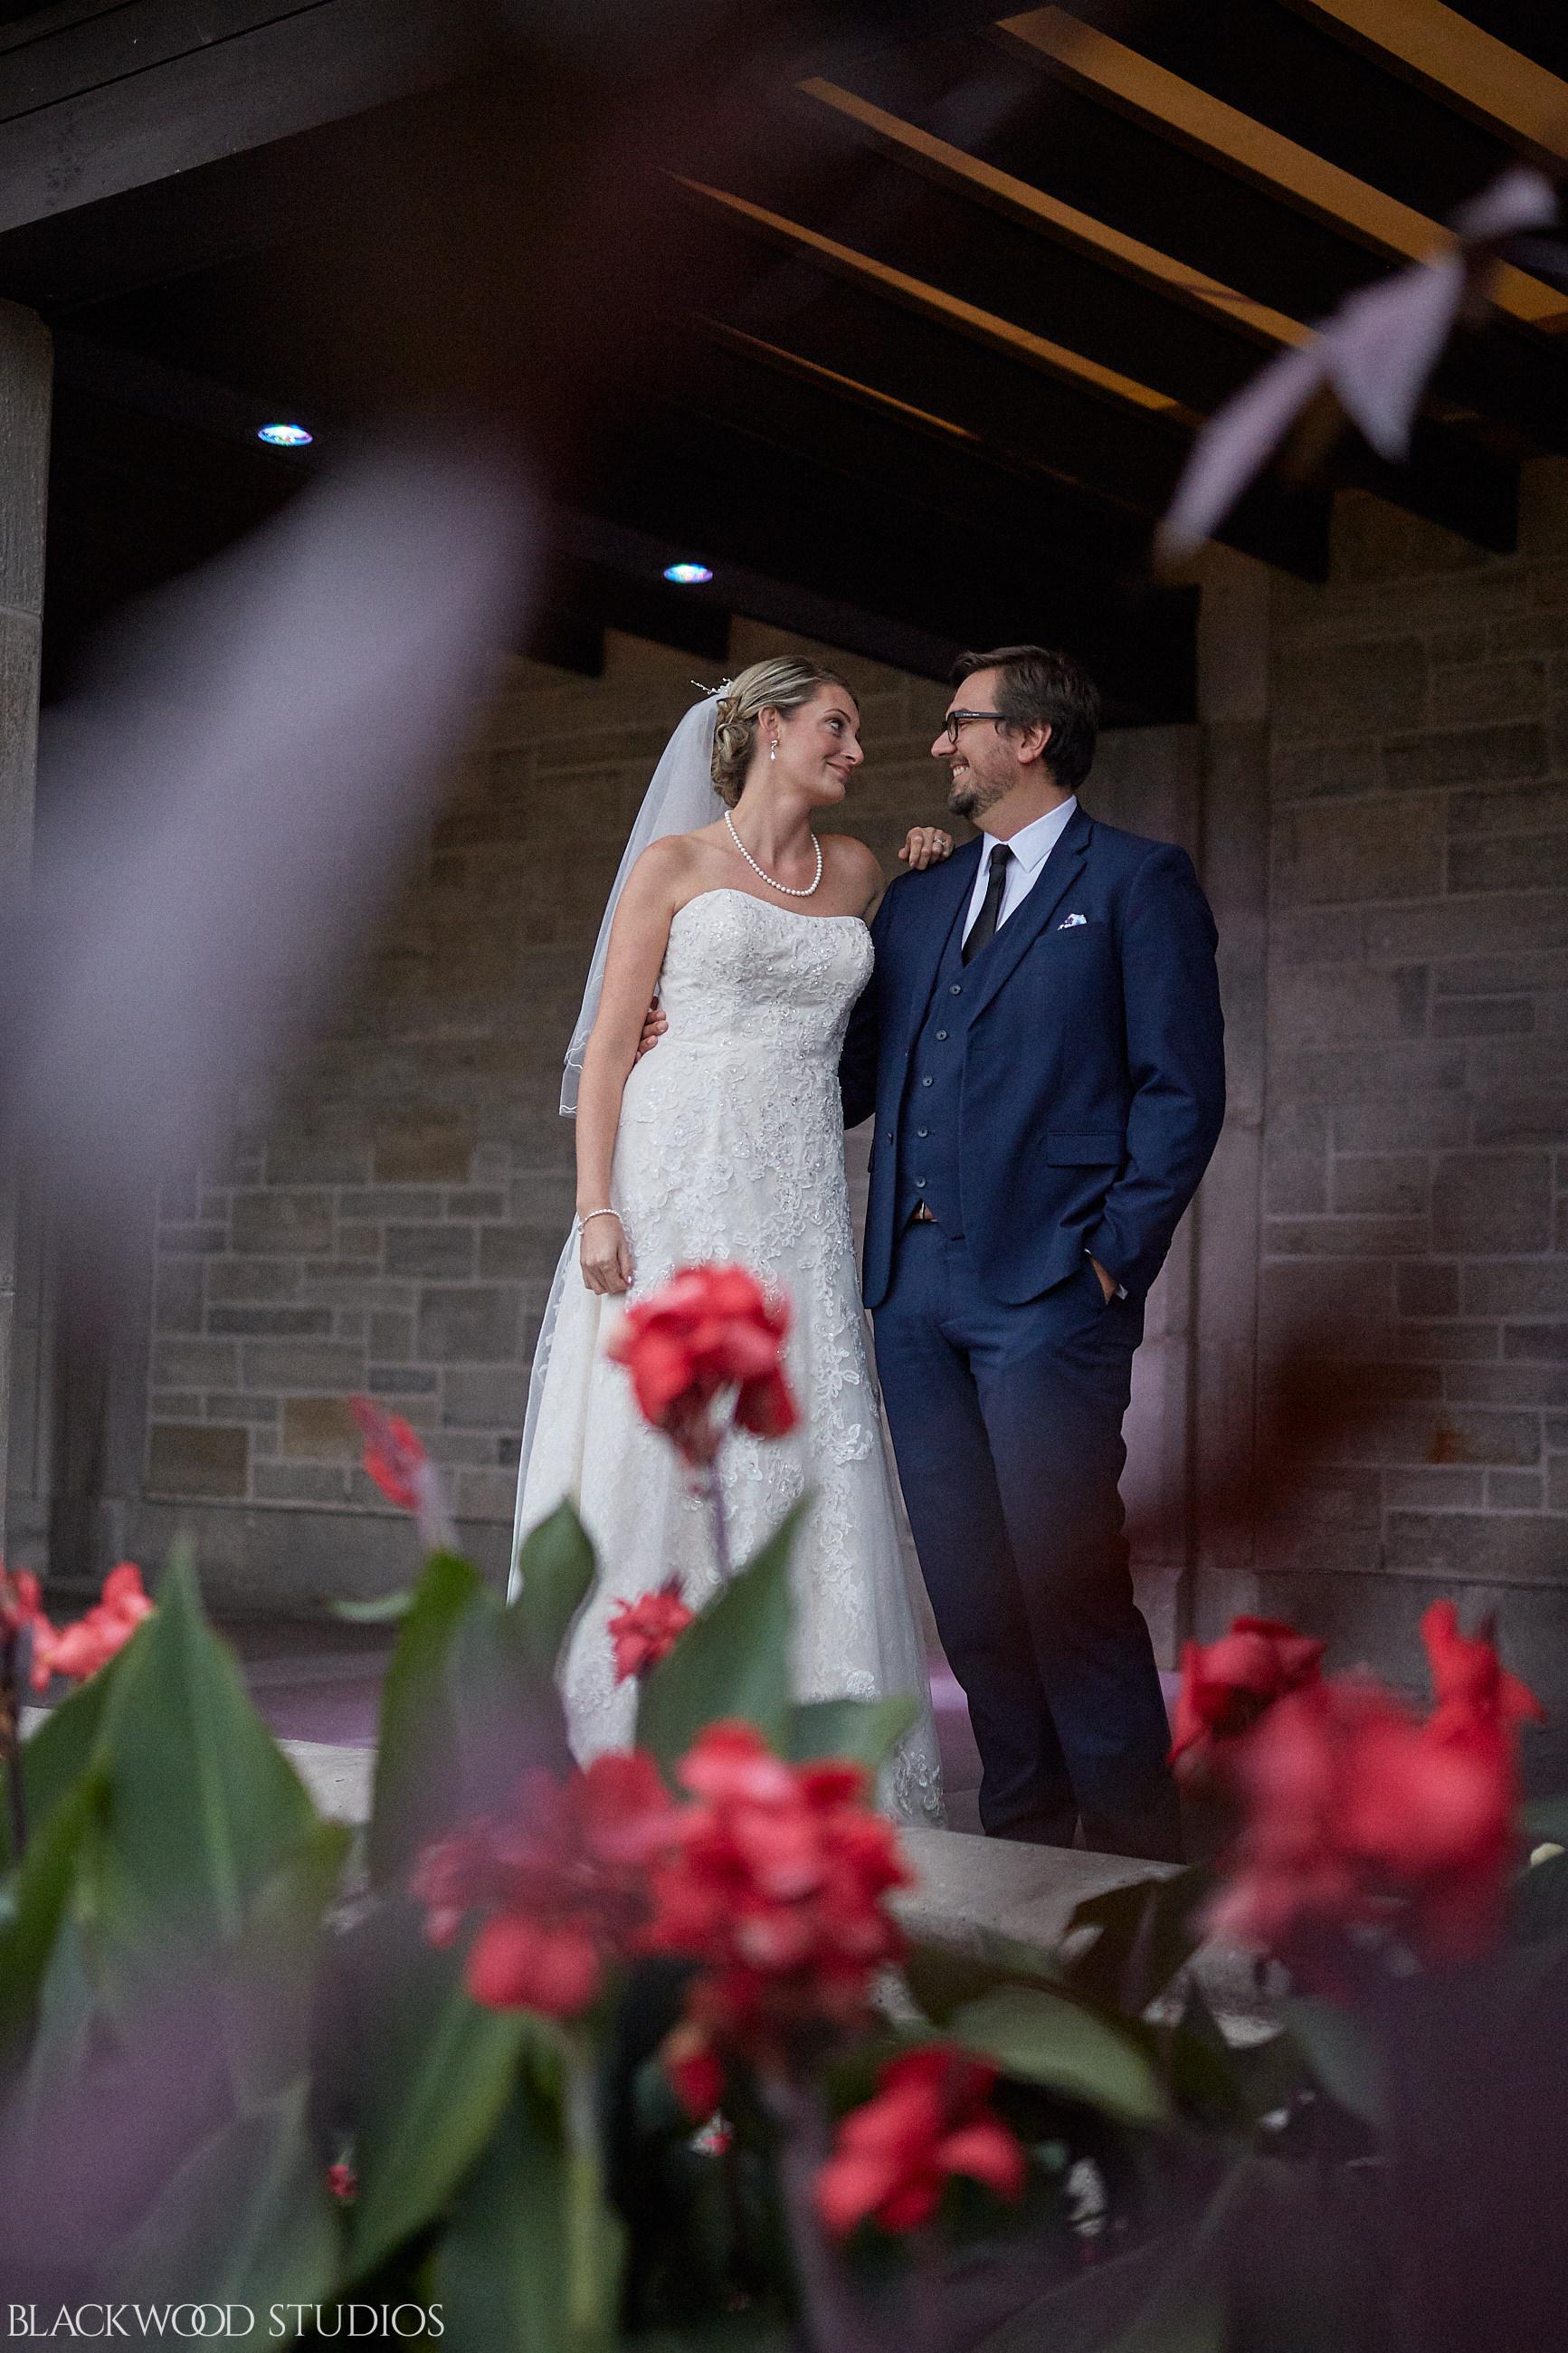 Blackwood-Studios-Wedding-Photography-20170928-185116-Marek-Katie-Michalek-Oakes-Garden-Theatre-Niagara-Falls-Ontario-Canada.jpg